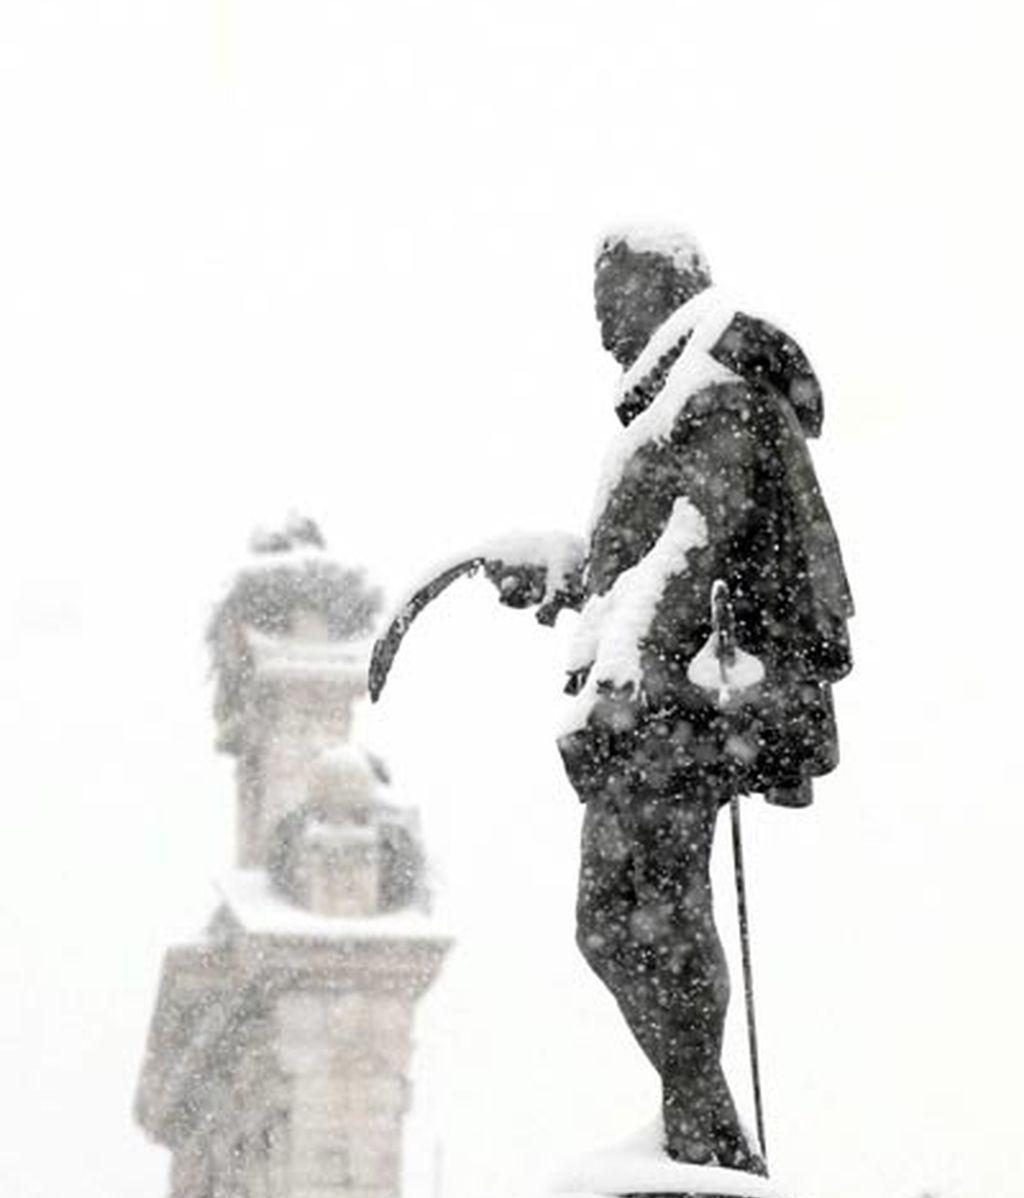 Madrid, colapsada por la nieve